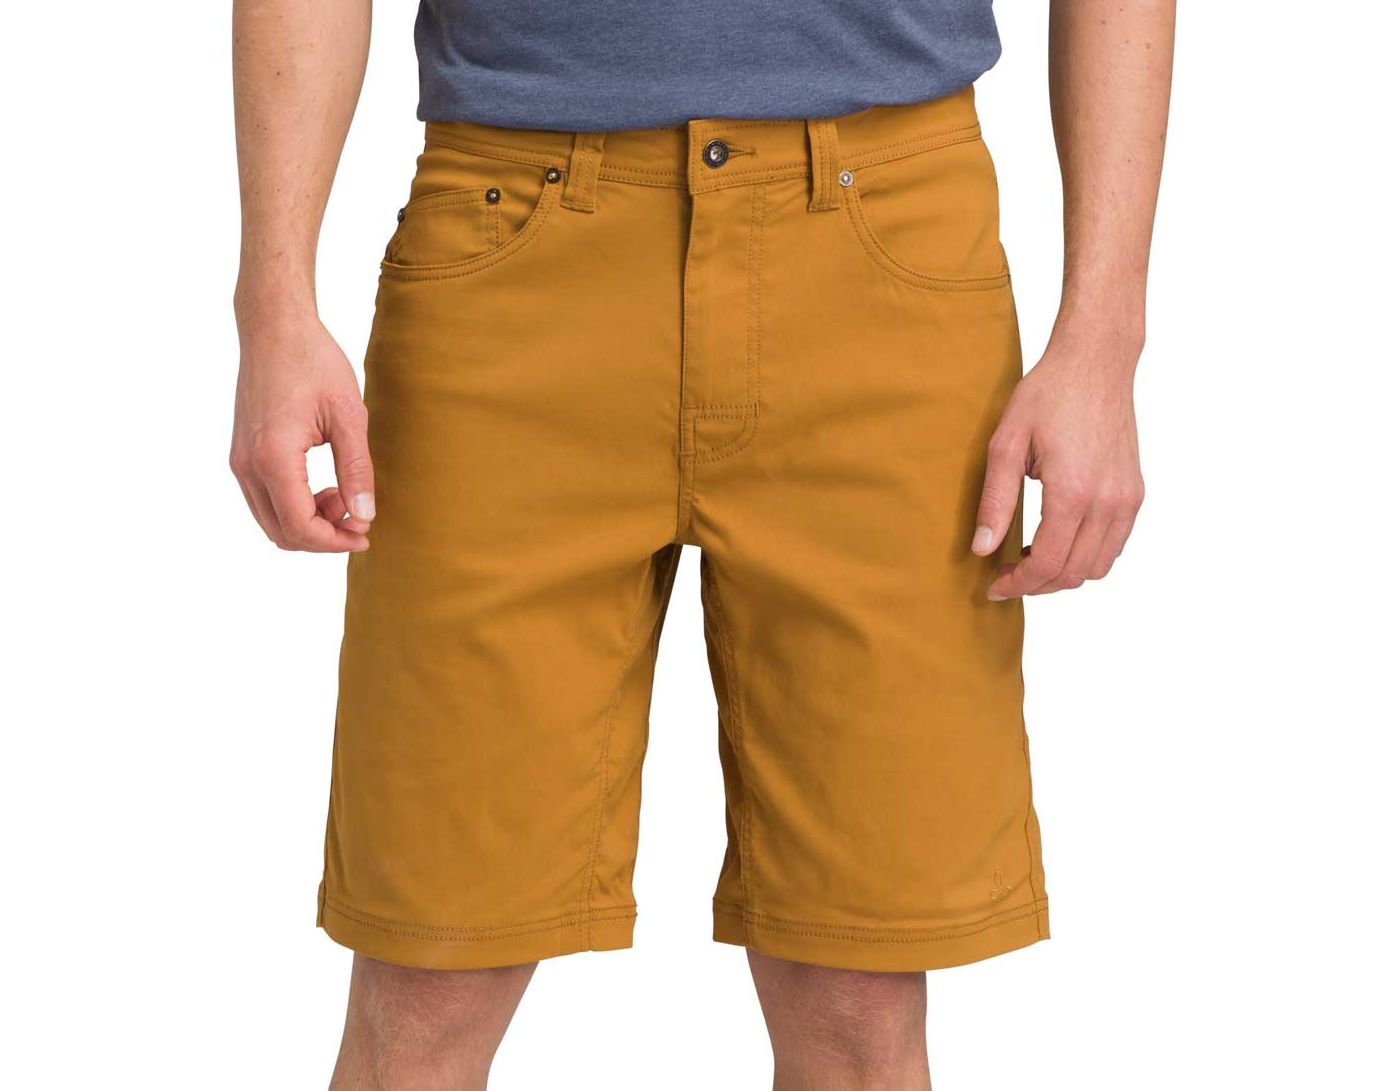 prAna Men's Brion Shorts (Regular and Big & Tall)